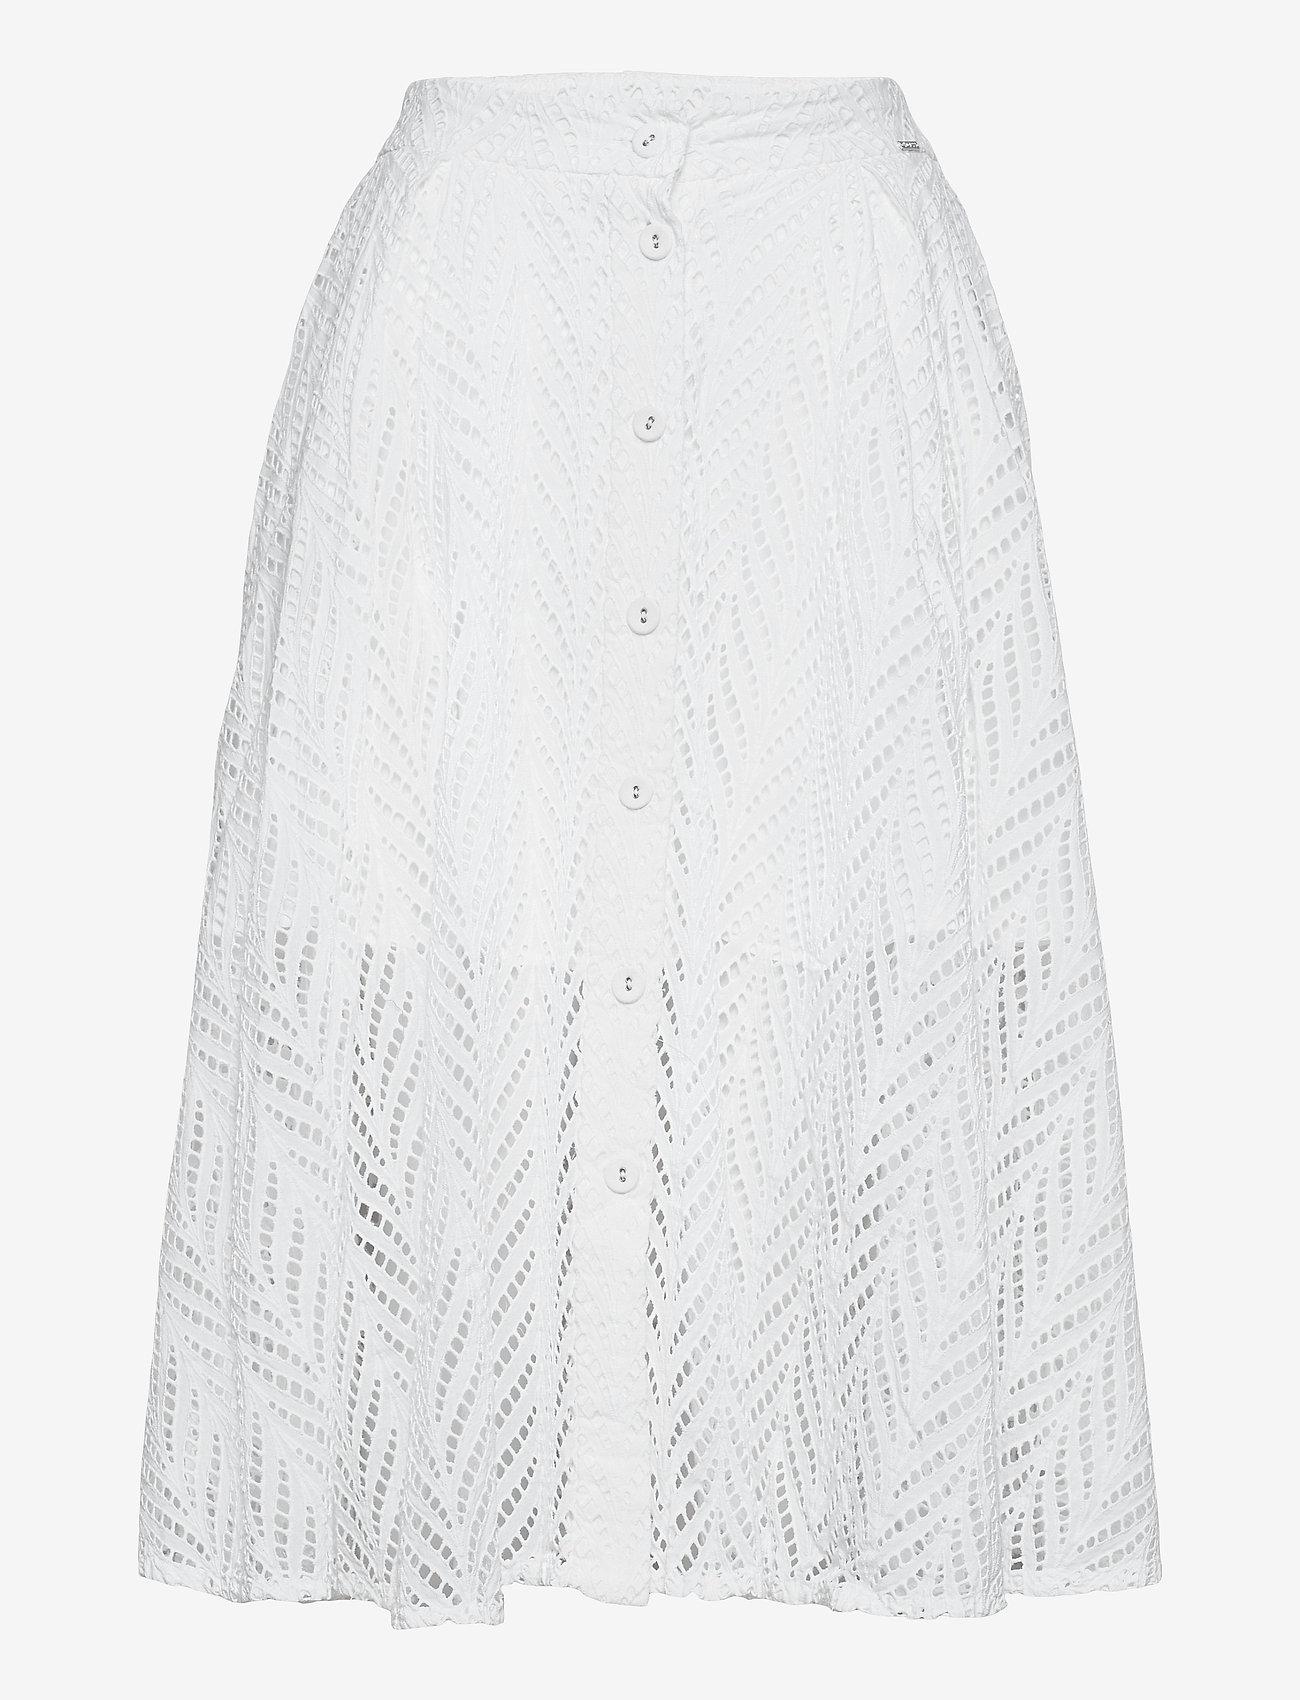 GUESS Jeans - NAJM SKIRT - jupes midi - true white a000 - 0